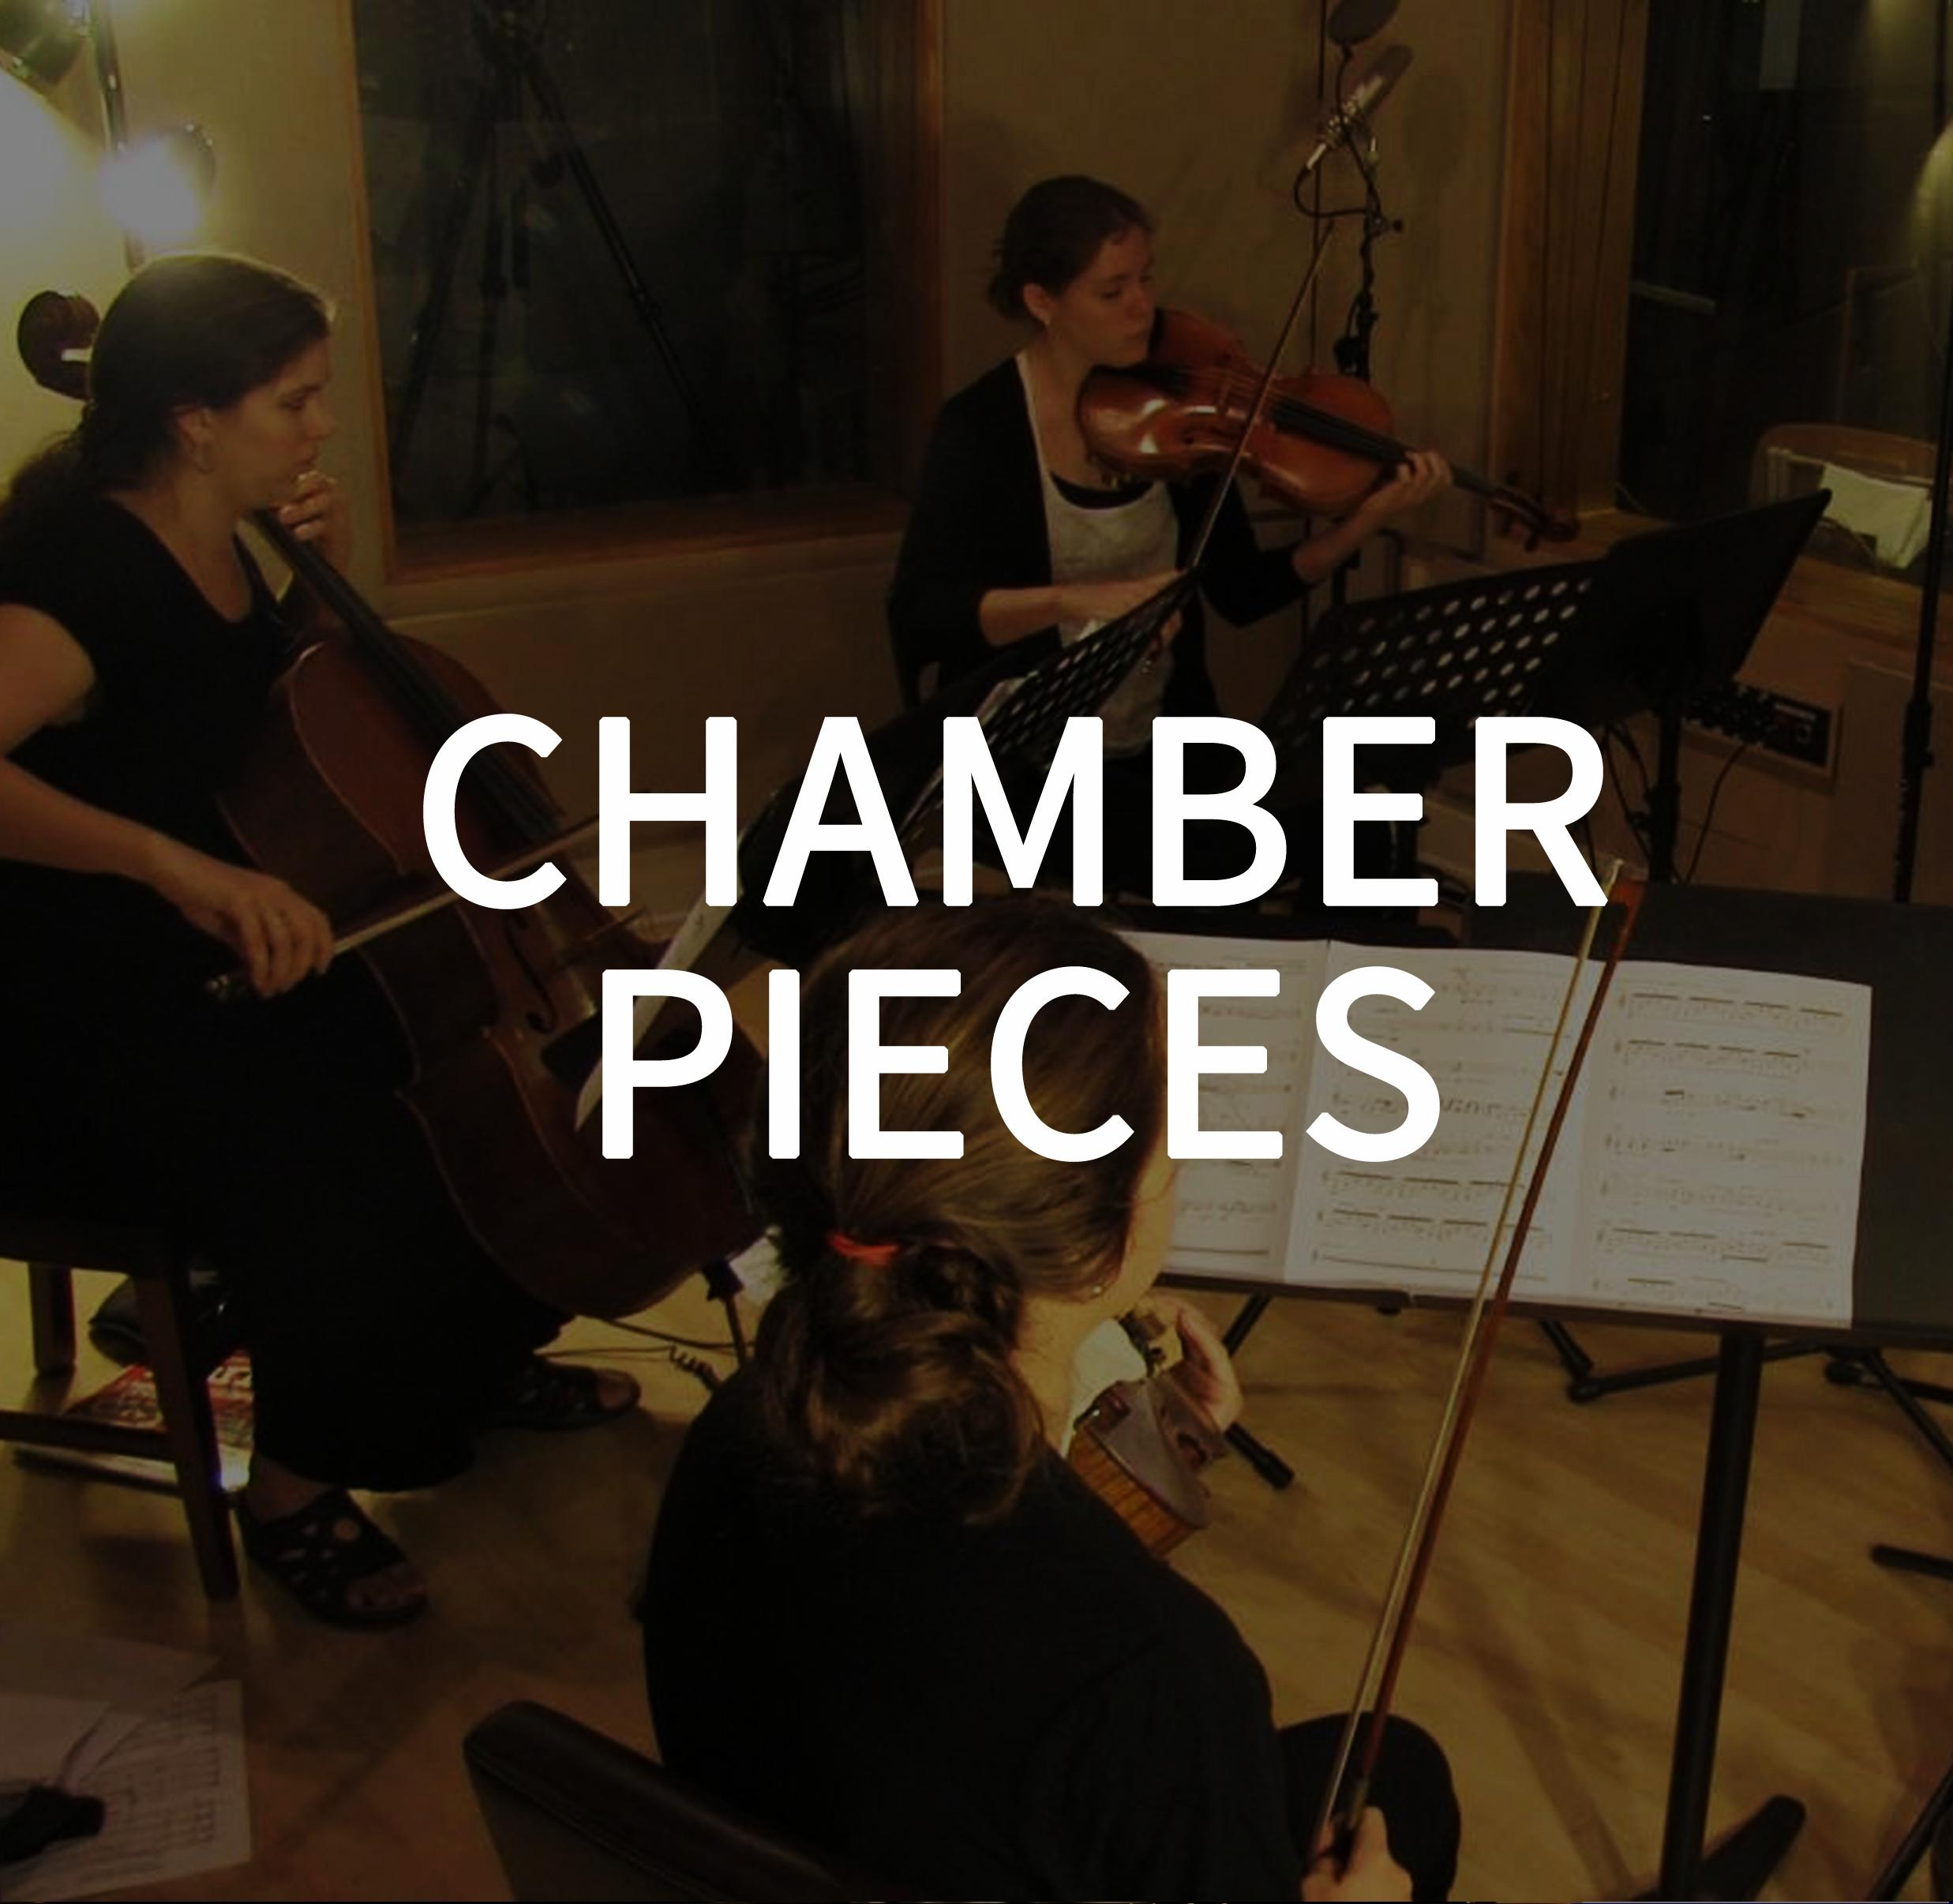 chamber pieces botao.jpg